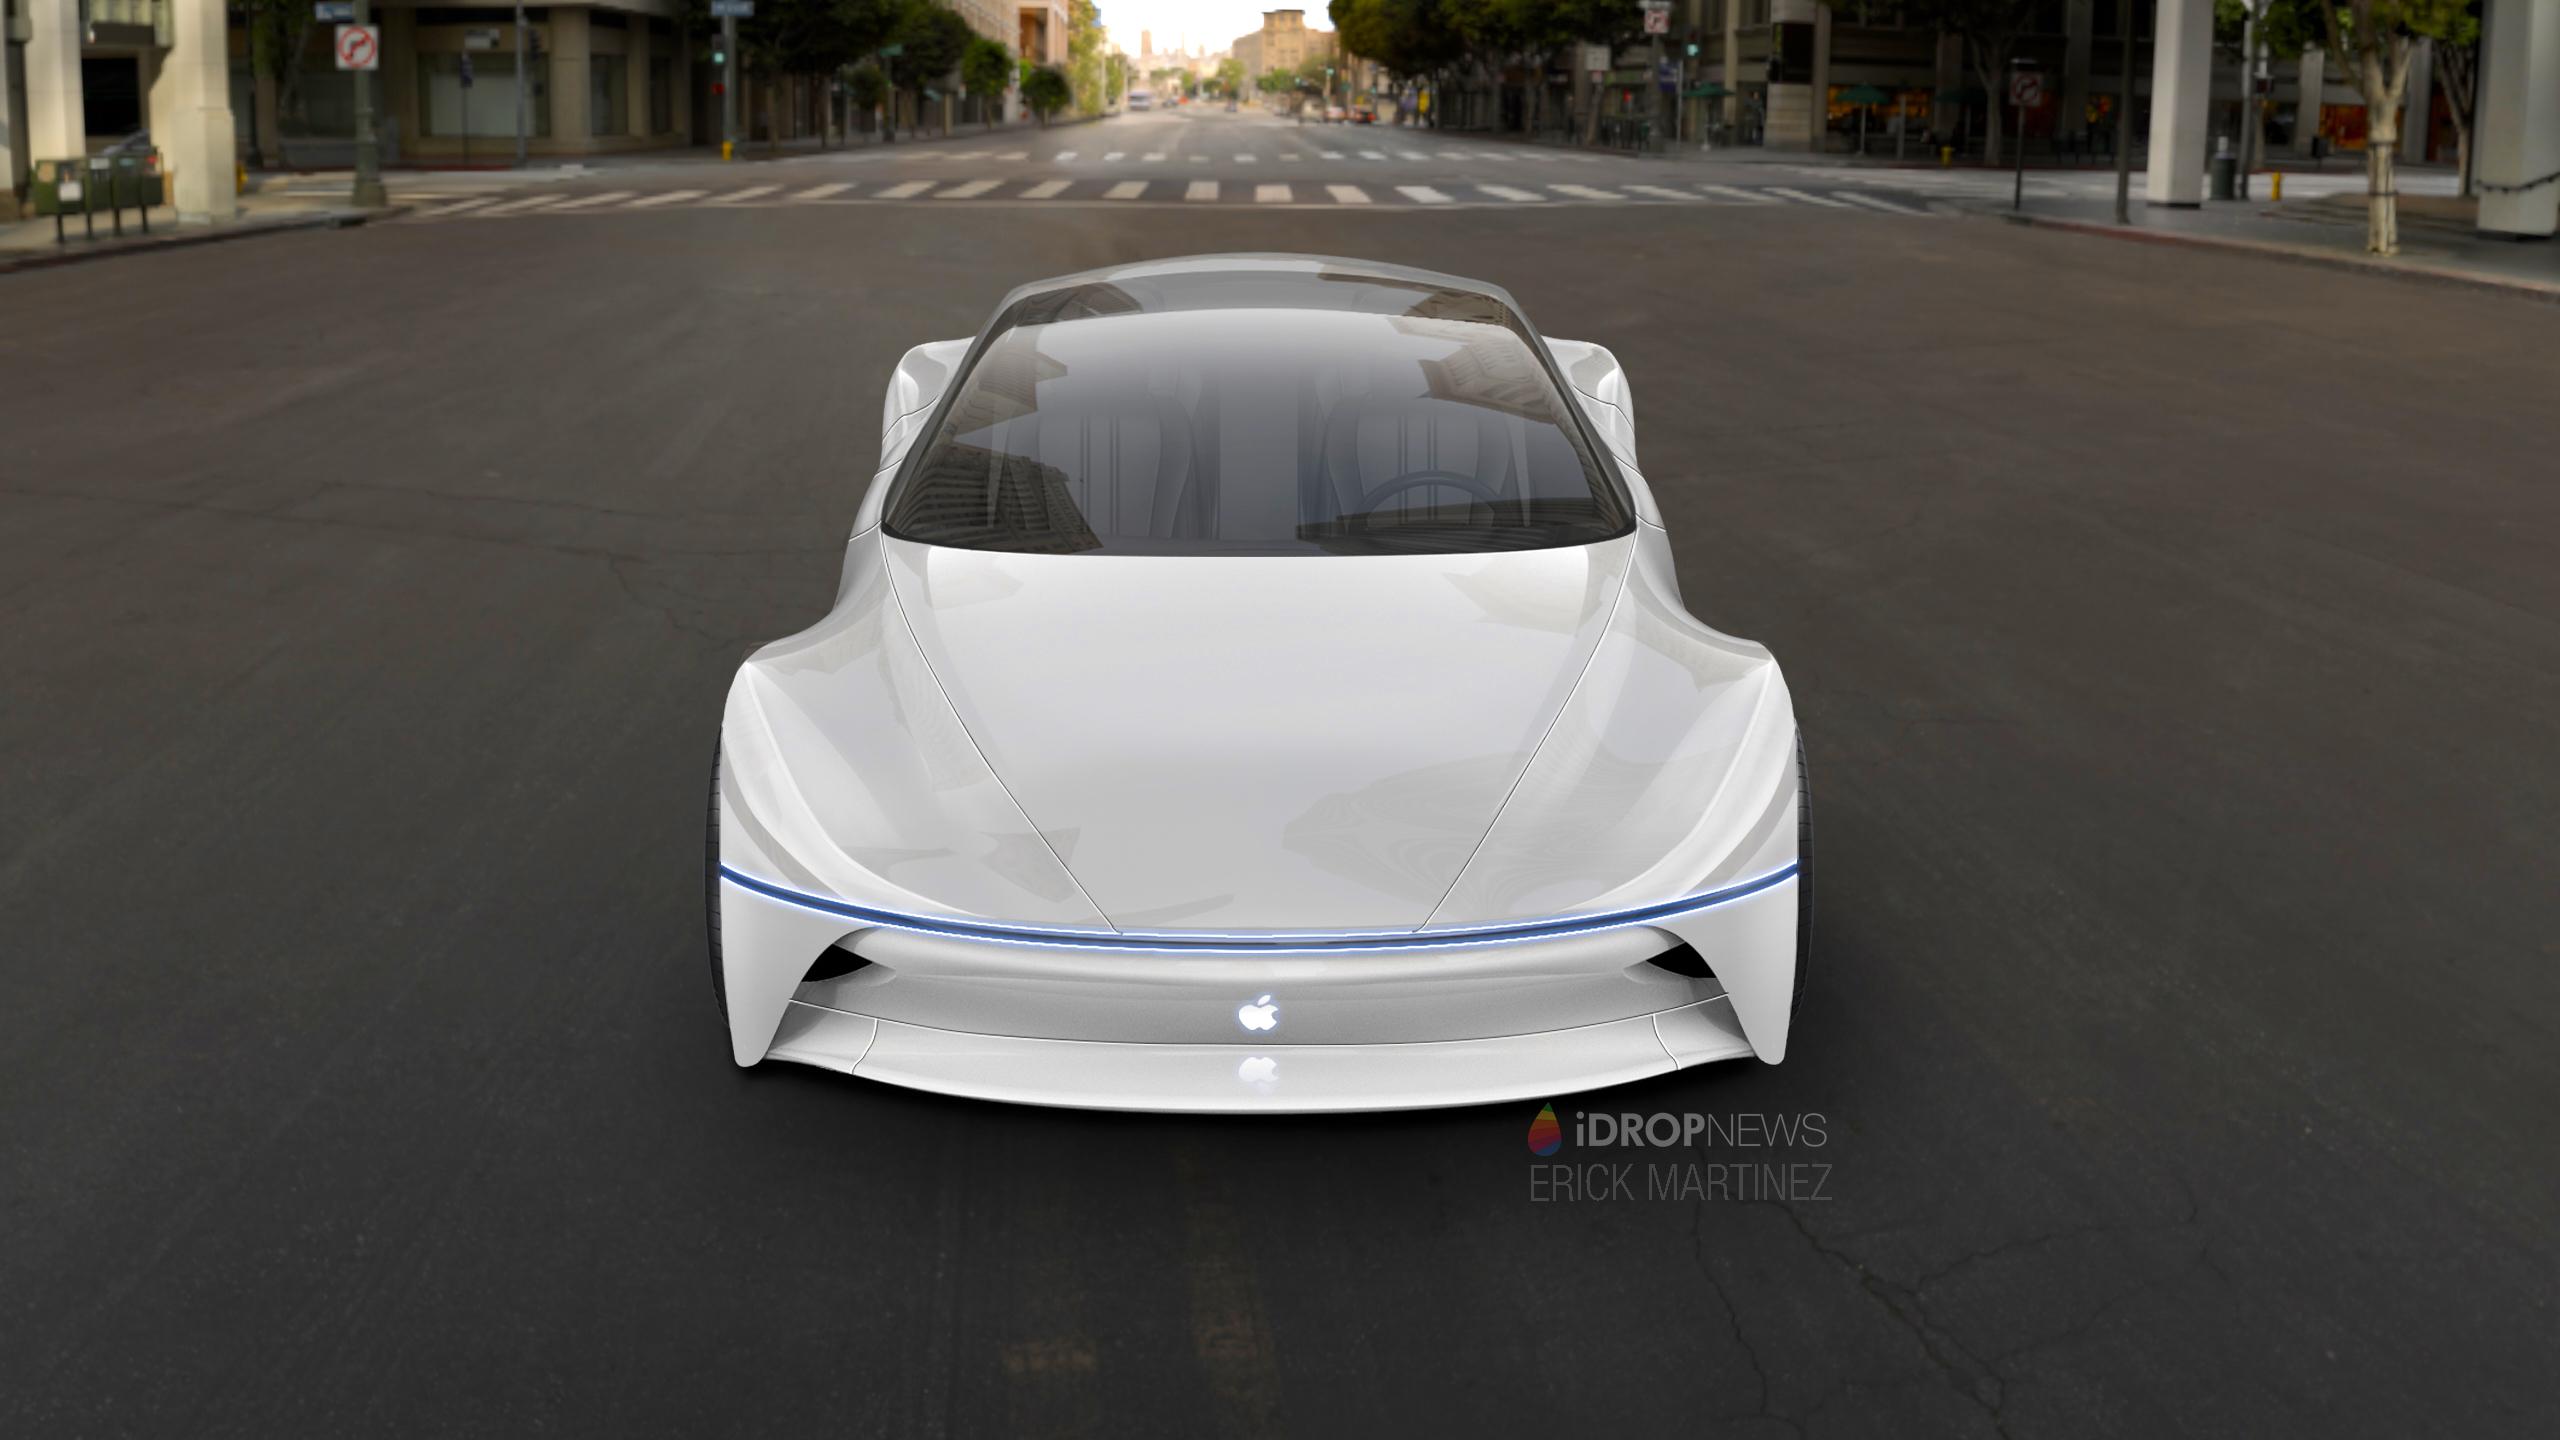 apple-car-concept-renders-idrop-news-3